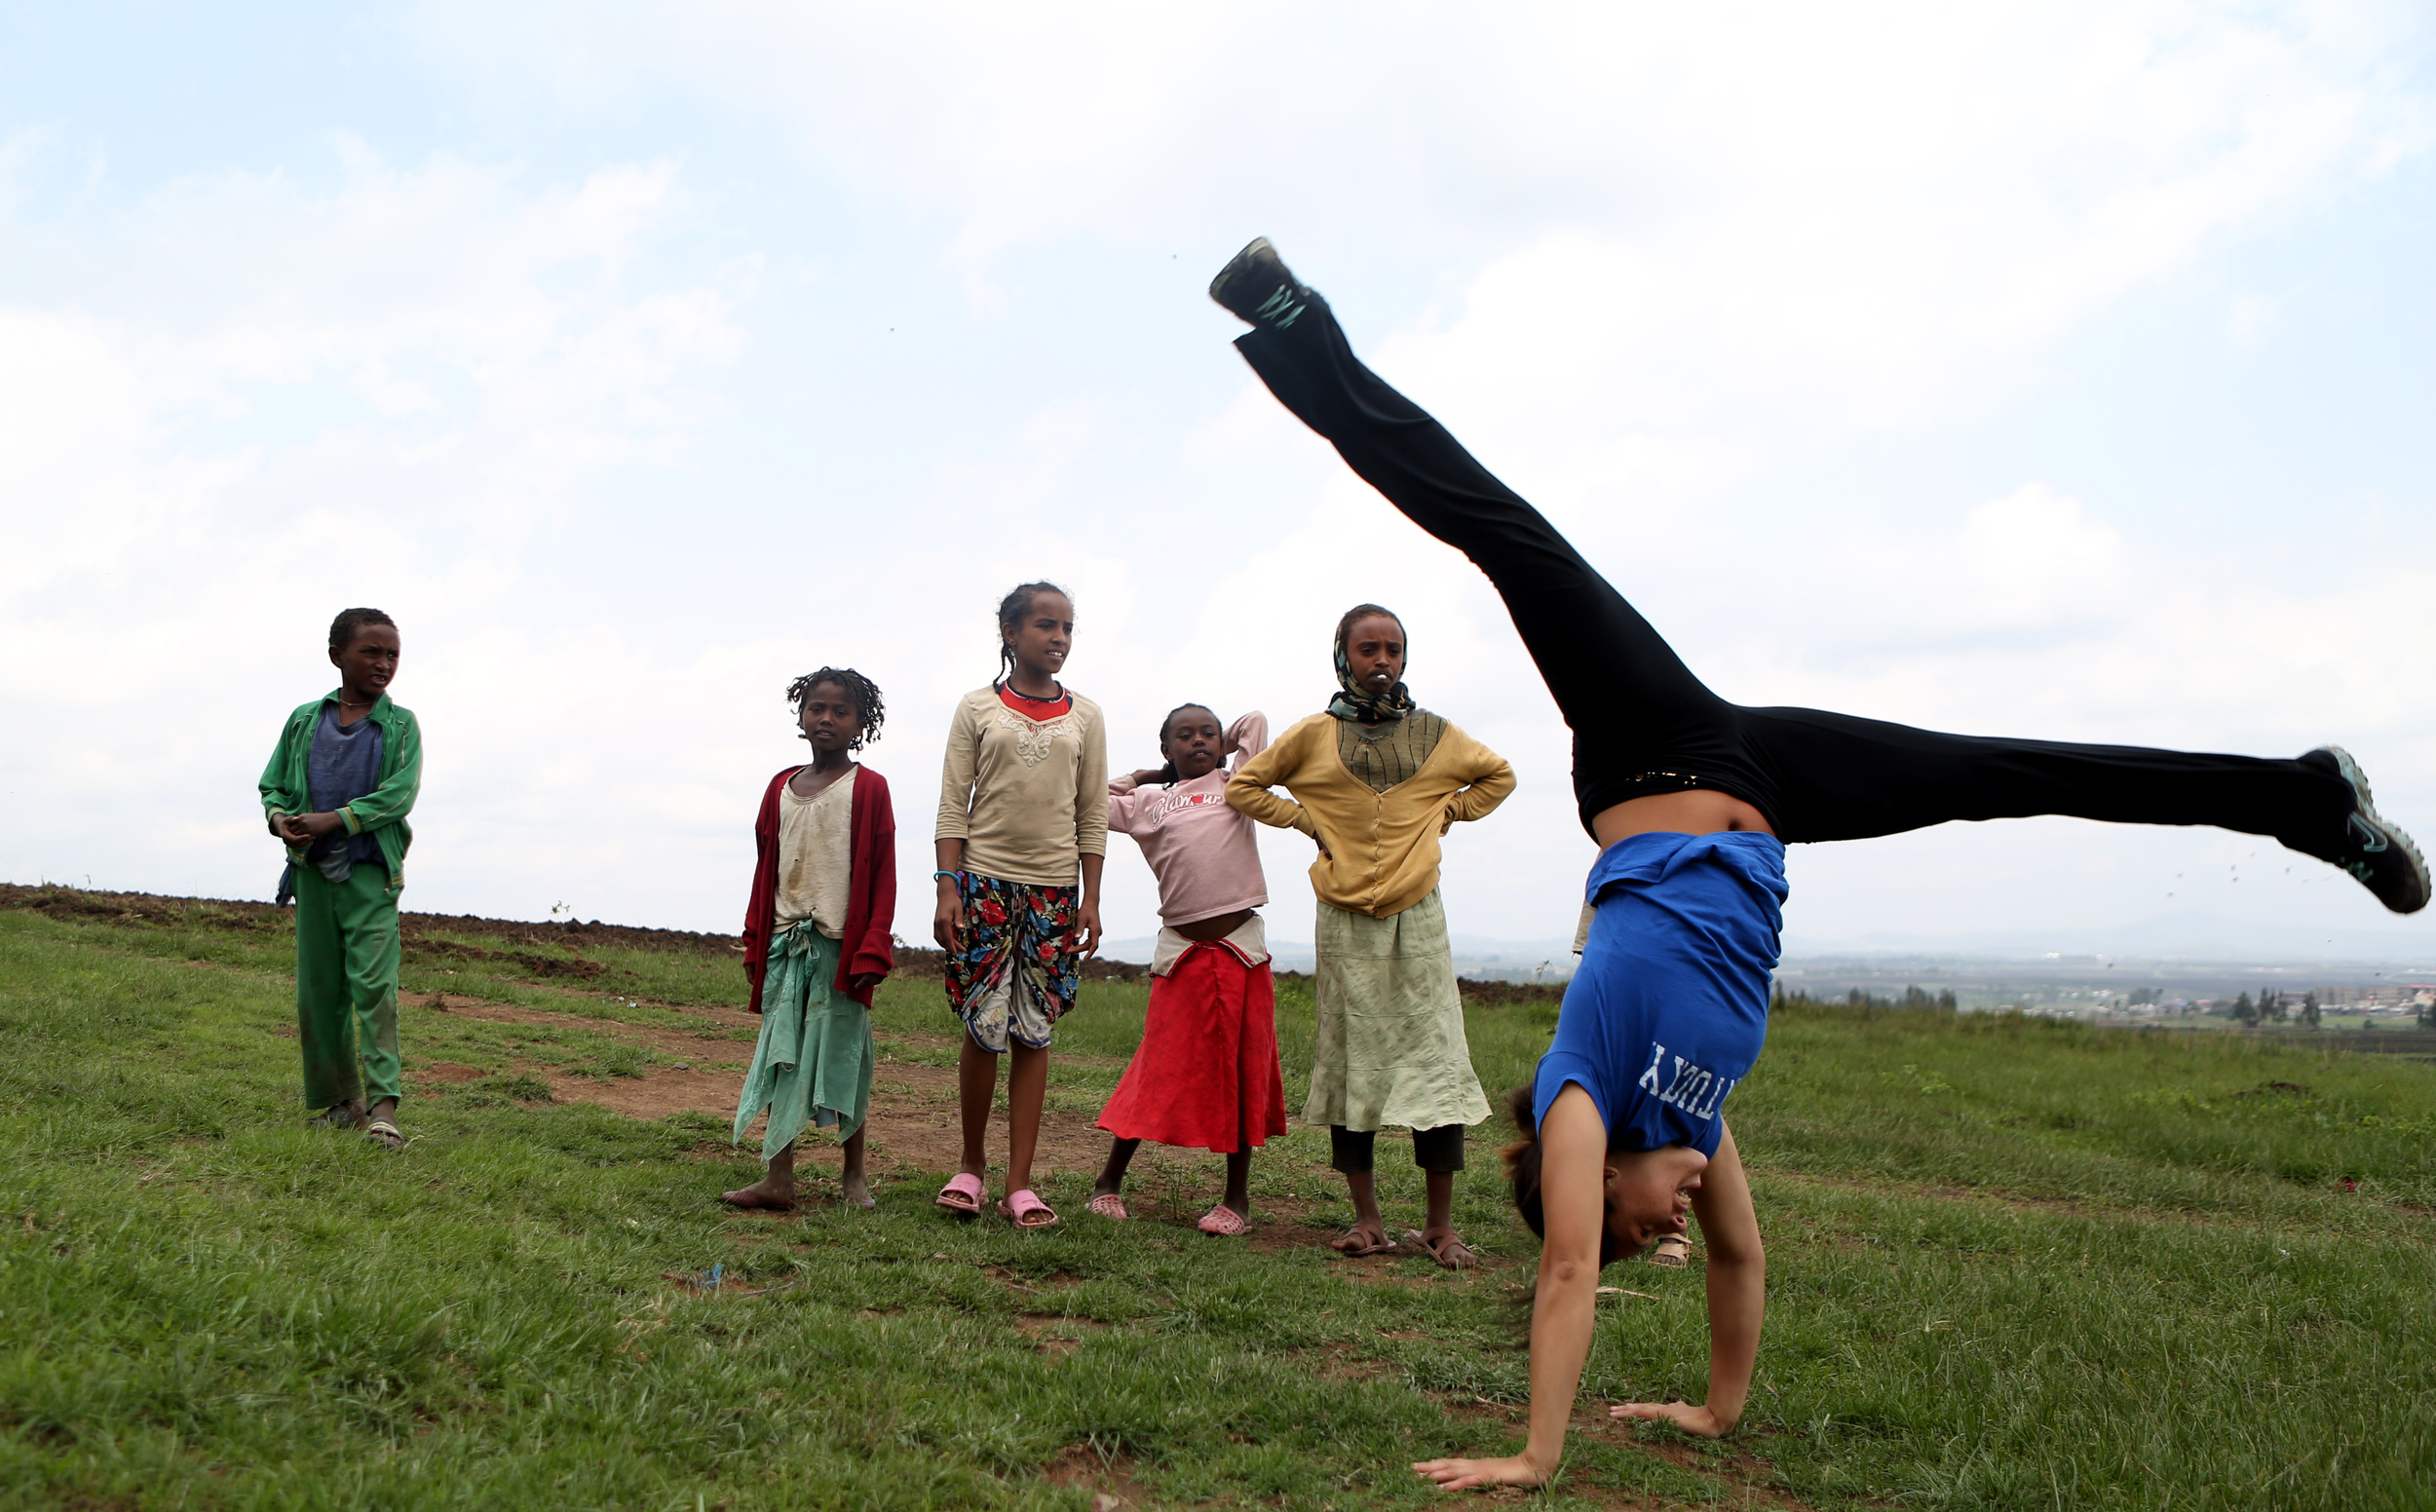 uk_Ethiopia_day1_4340_bdm.jpg